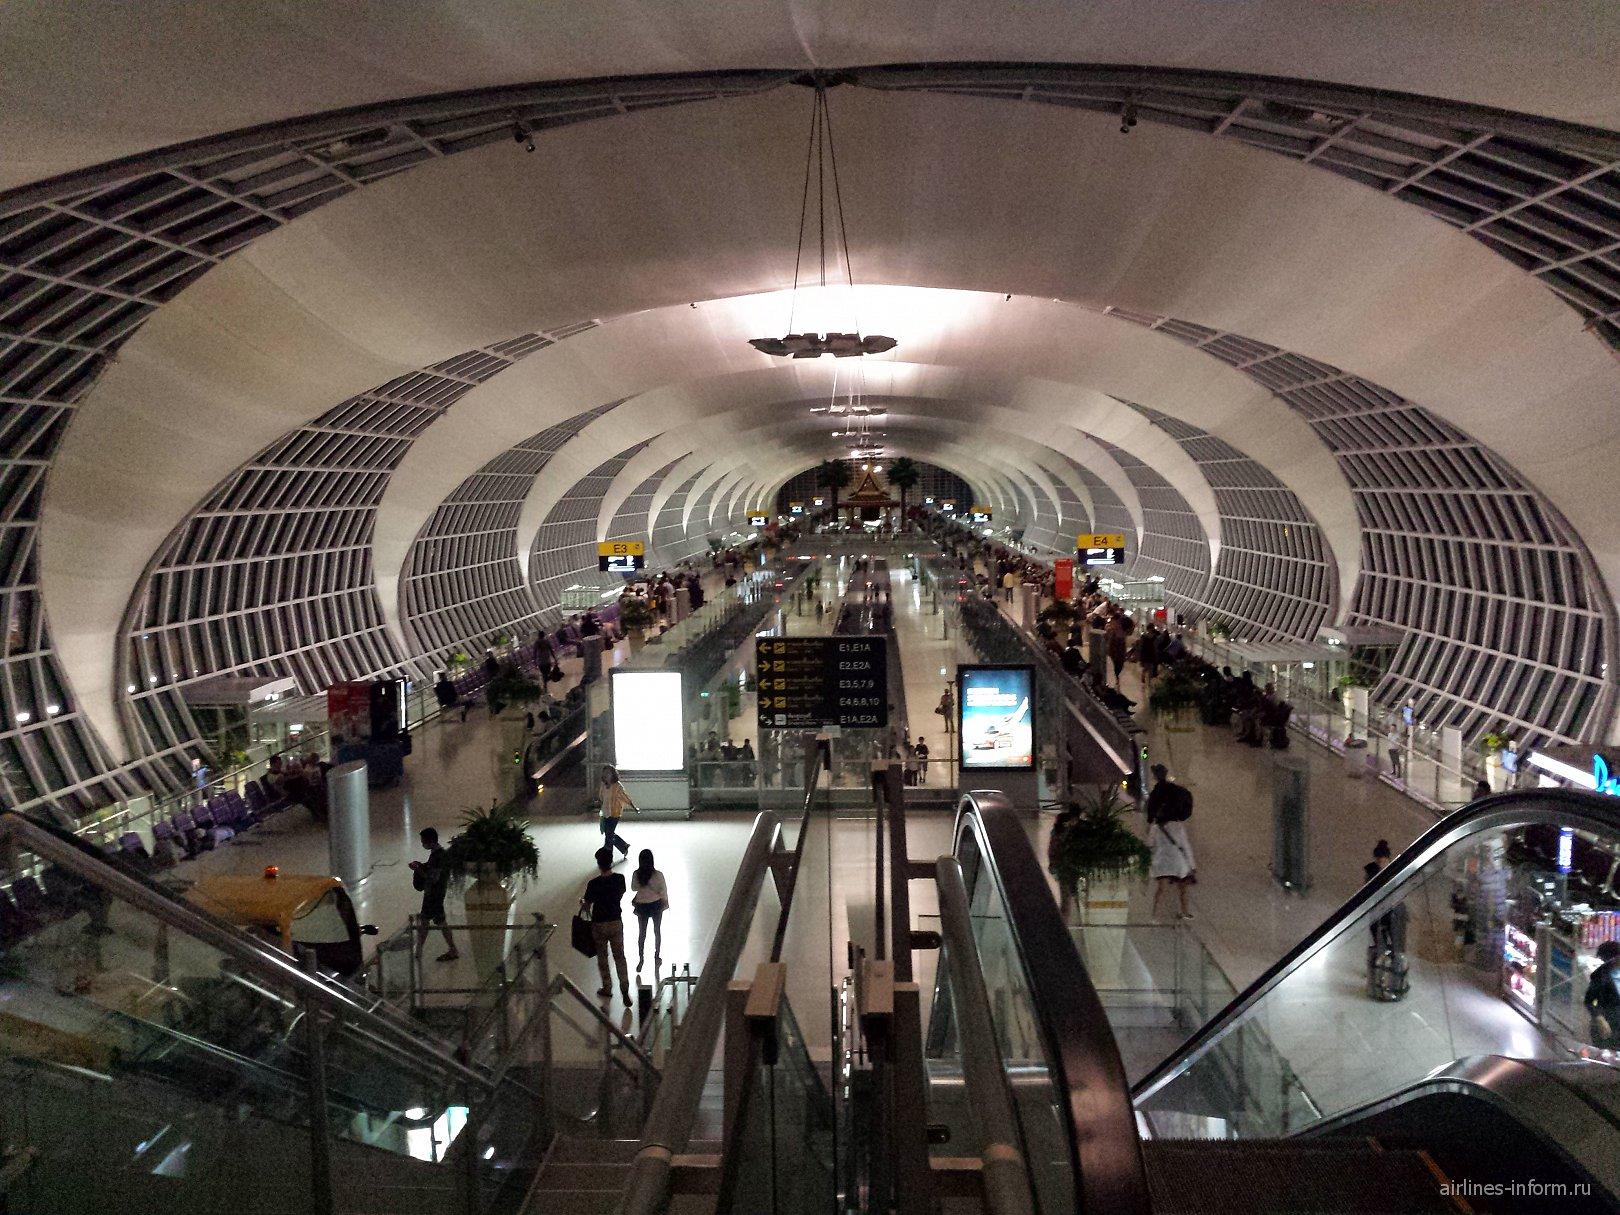 Галерея выходов на посадку в аэропорту Бангкок Суварнабуми